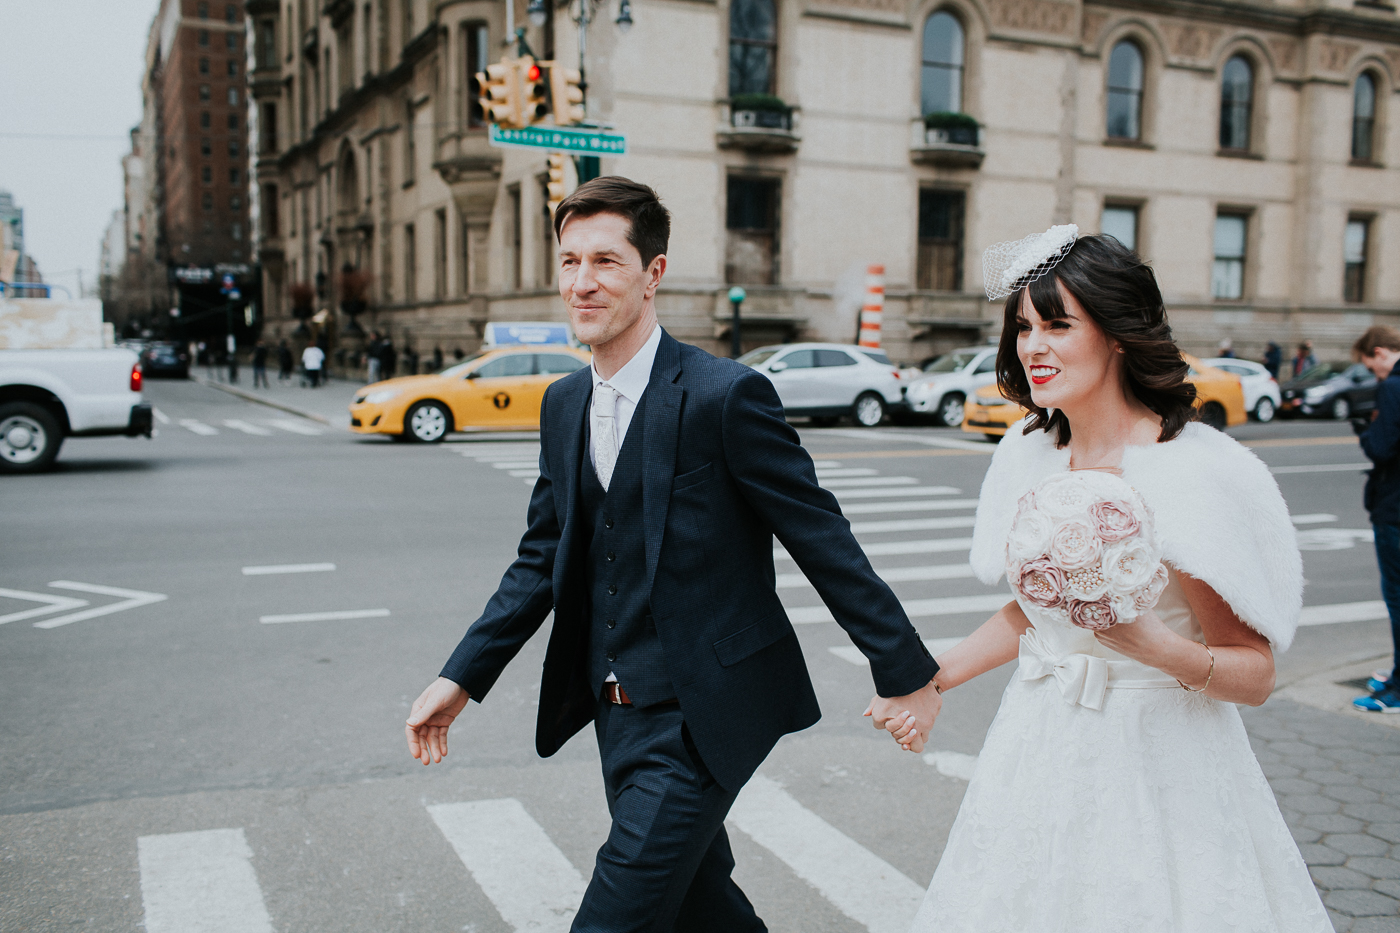 Ladies-Pavilion-Central-Park-NYC-Documentary-Elopement-Wedding-Photographer-13.jpg